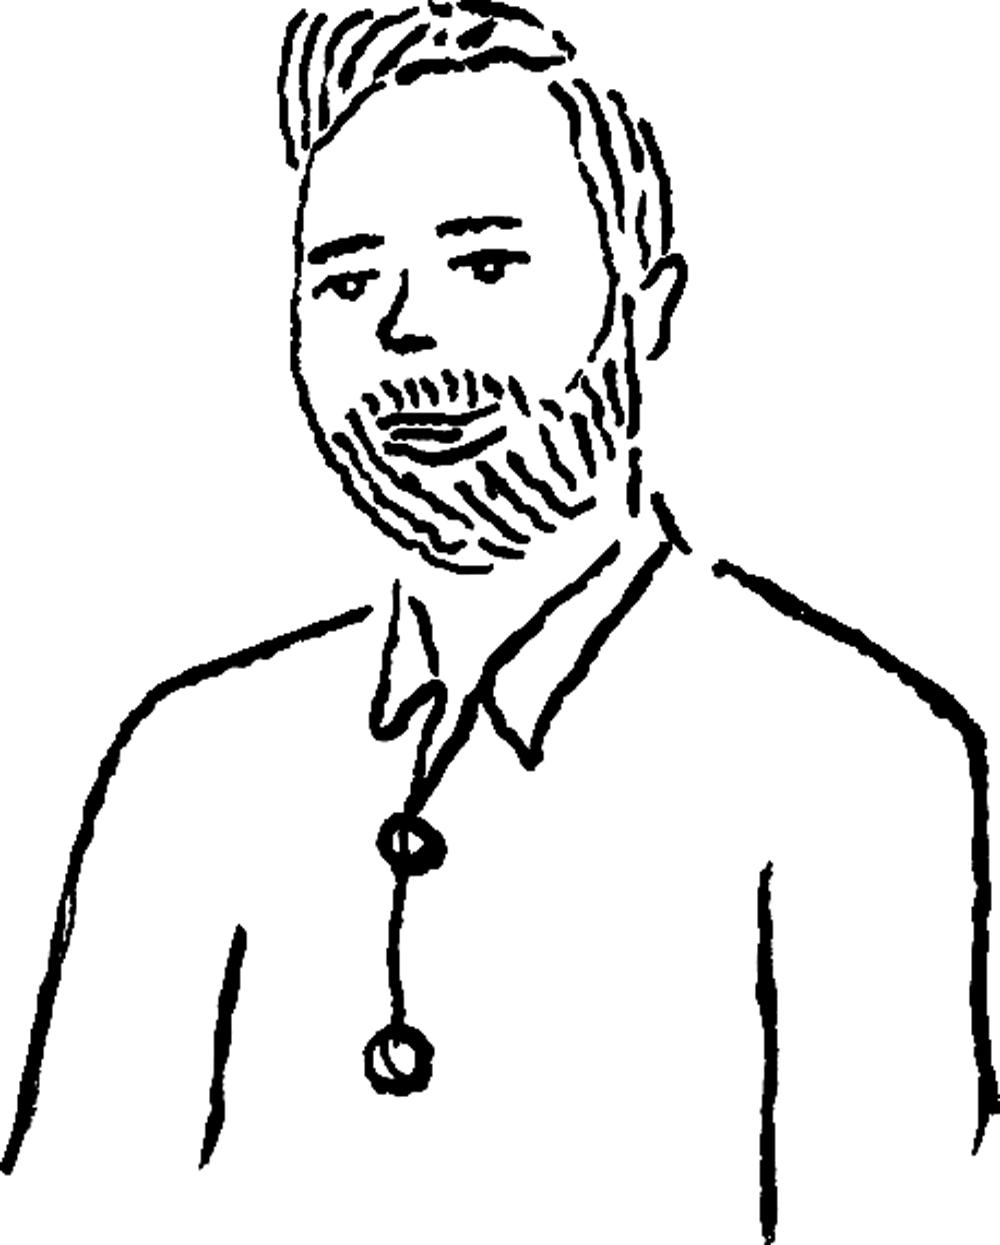 Brad Sturman